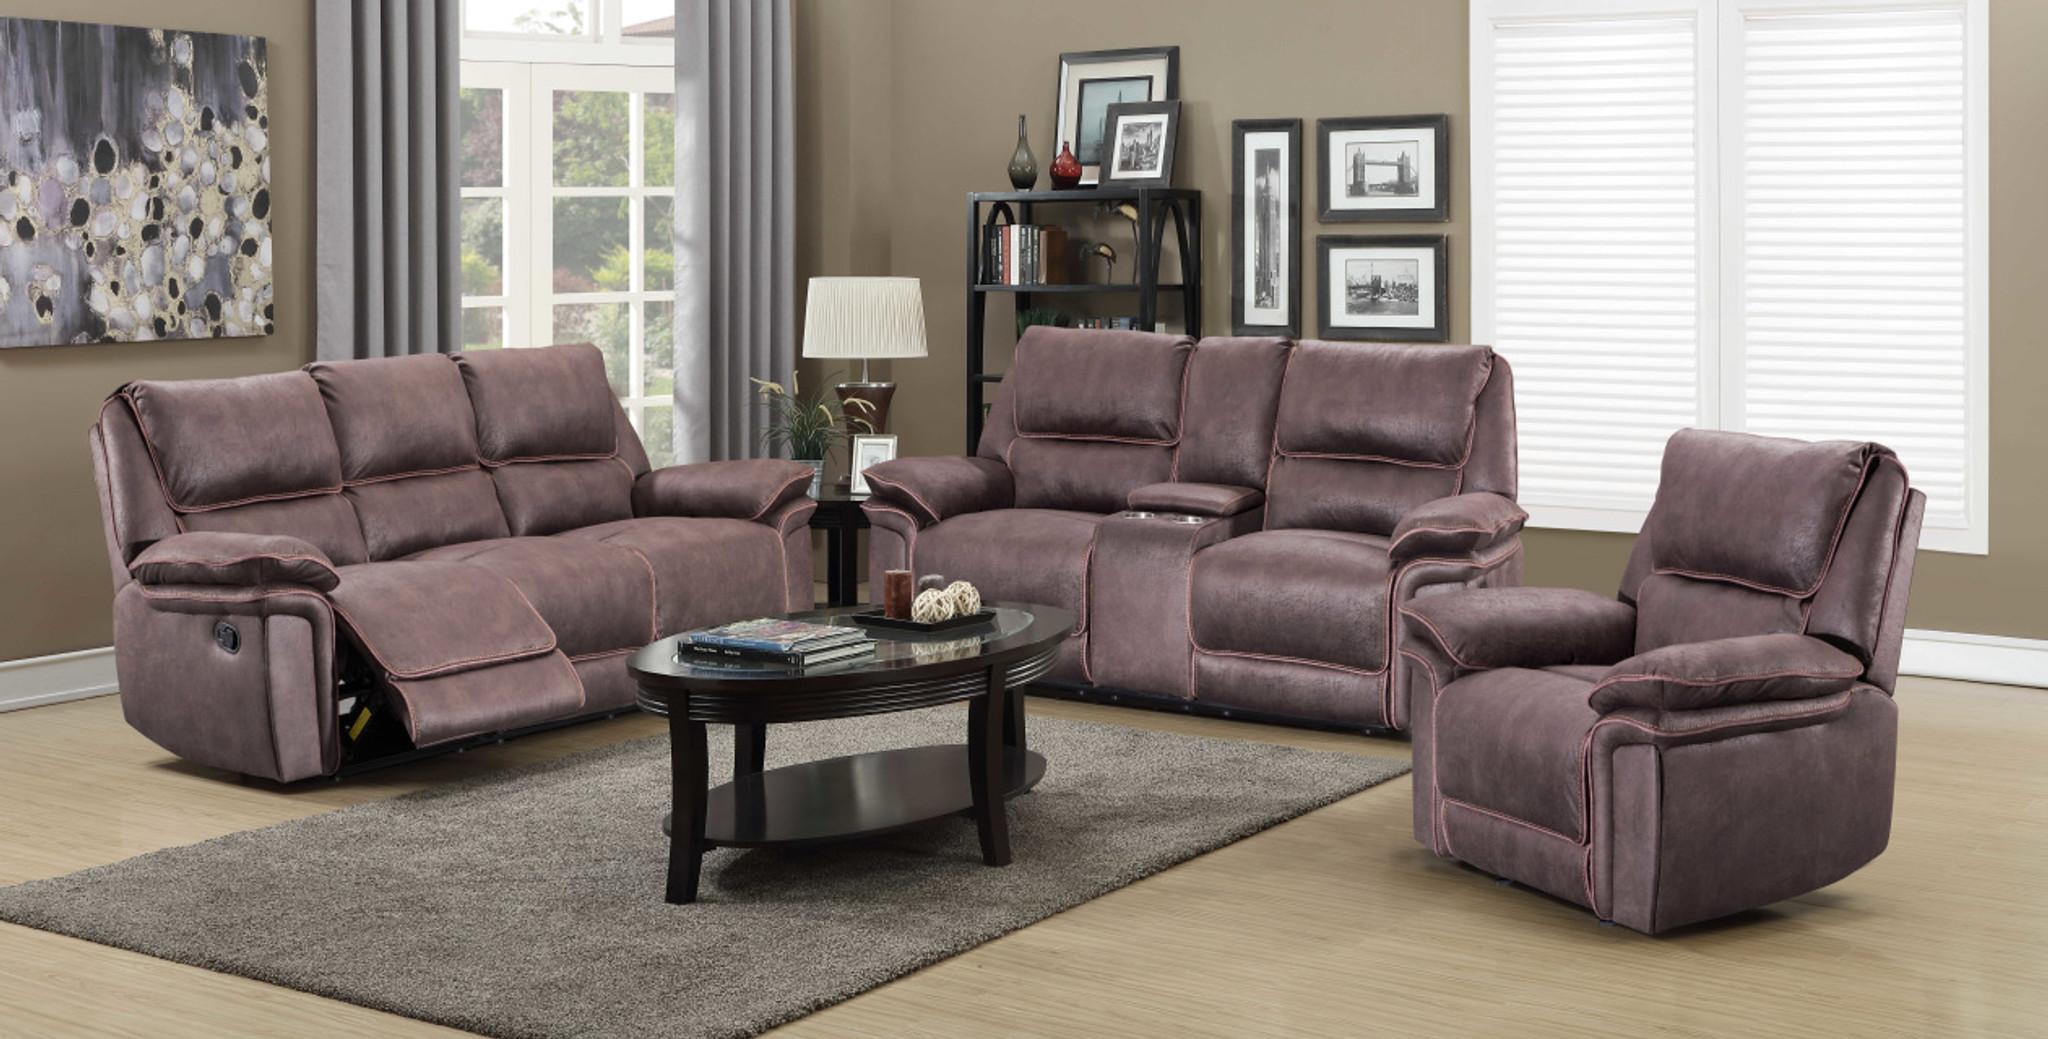 Wondrous 3Pcs Karla Recliner Sofa Loveseat And Chair Set Interior Design Ideas Skatsoteloinfo